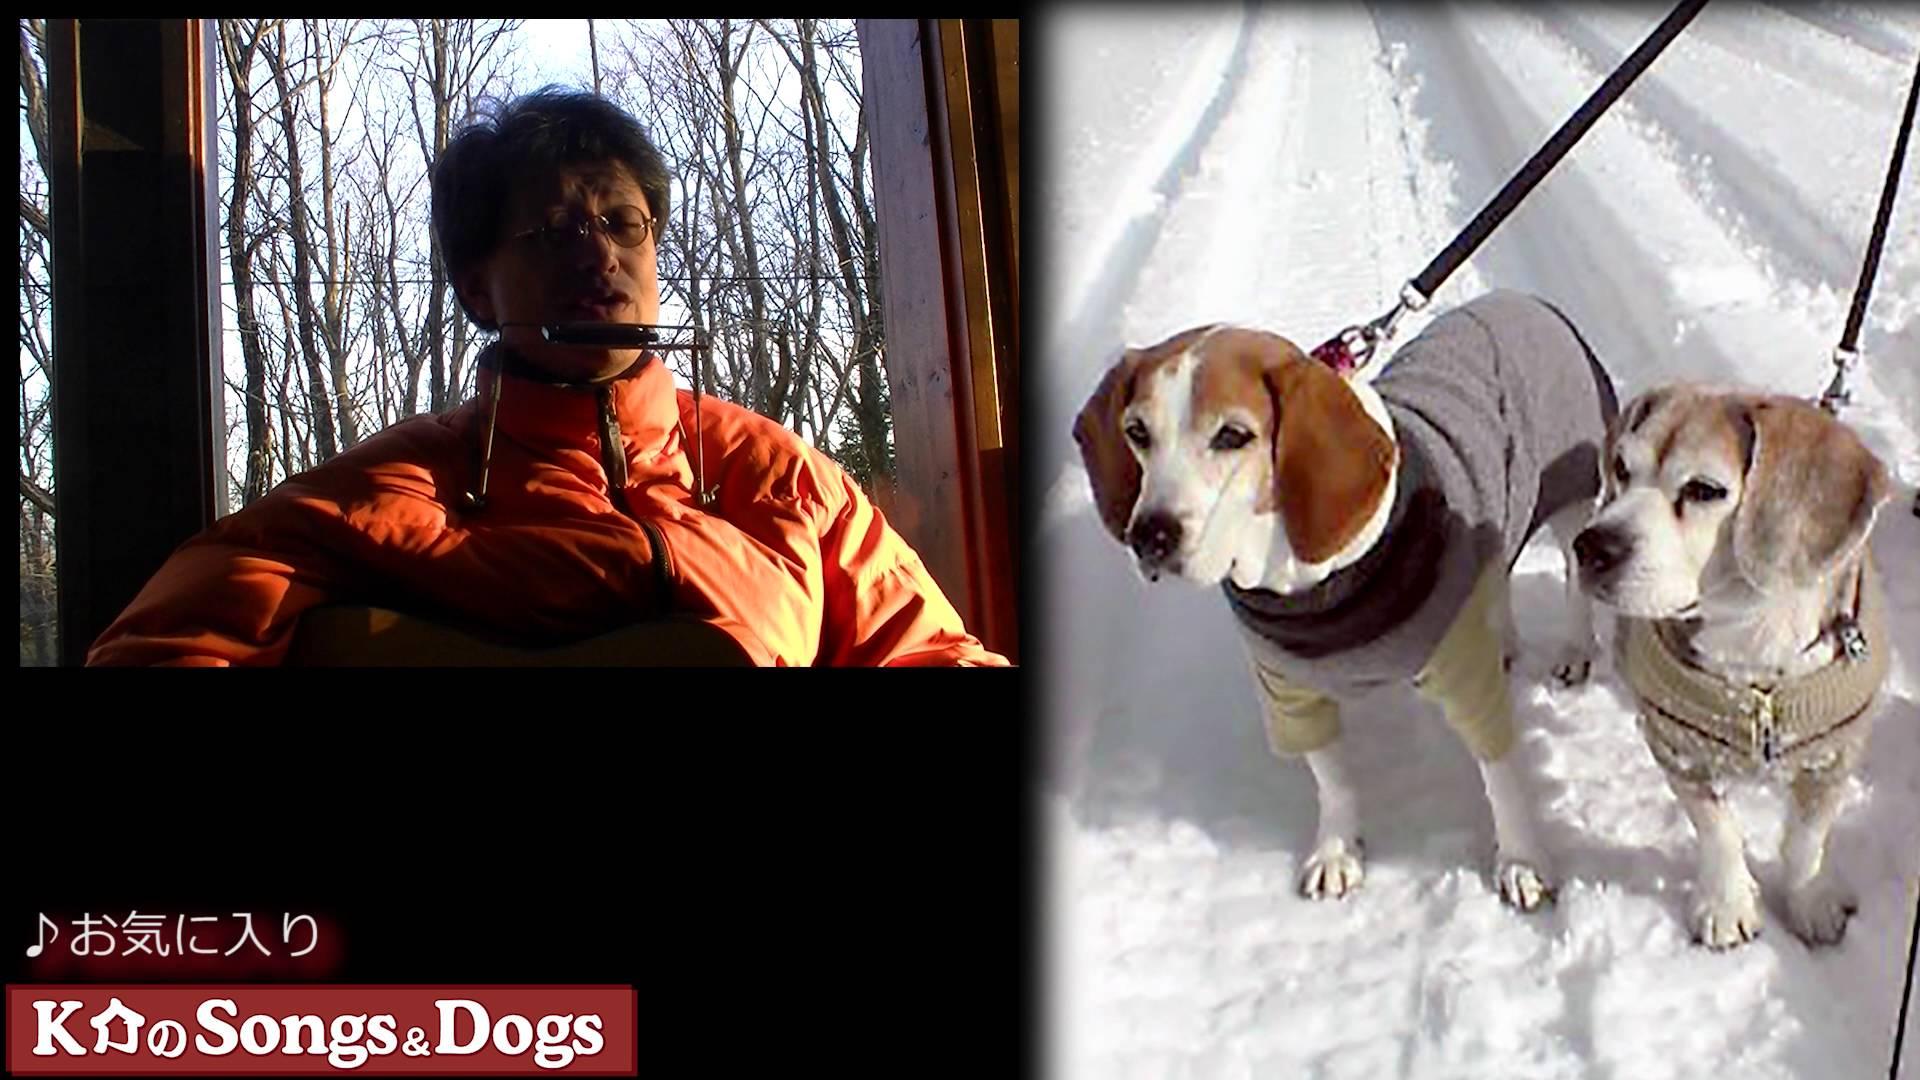 104th: K介のSongs&Dogs週末はミュージシャン